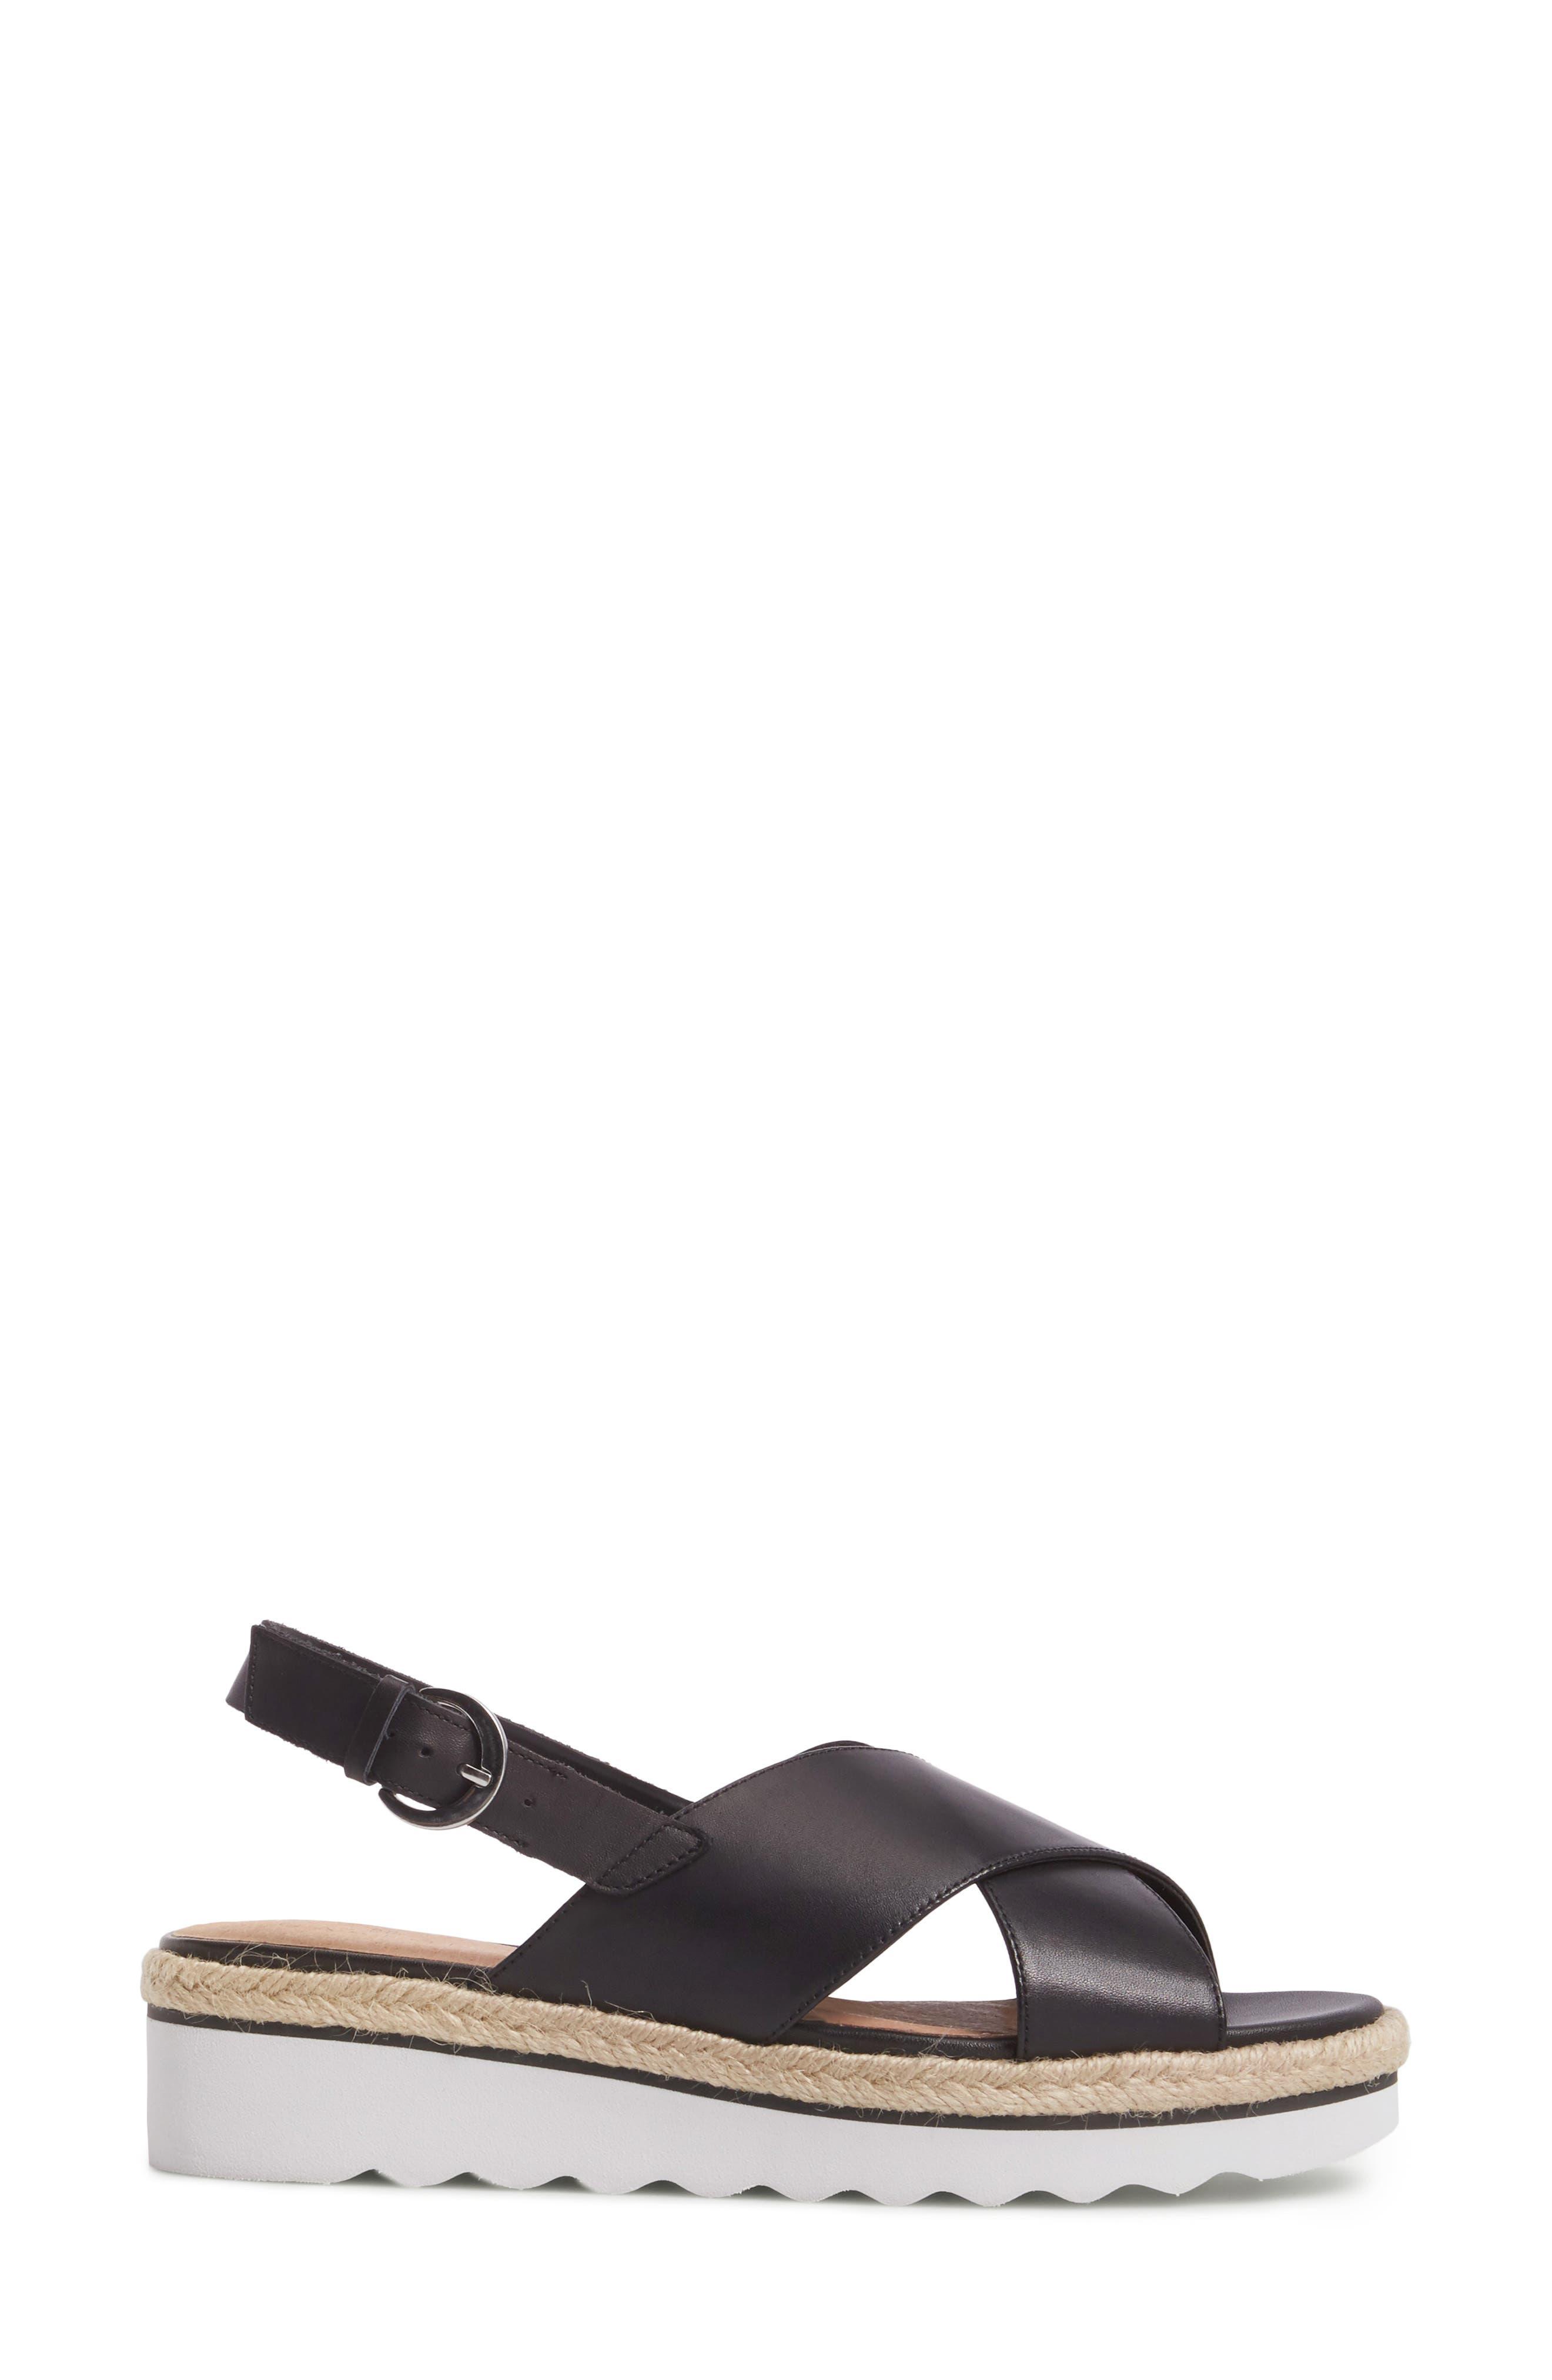 Caslon Lucas Slingback Sandal,                             Alternate thumbnail 4, color,                             Black Leather